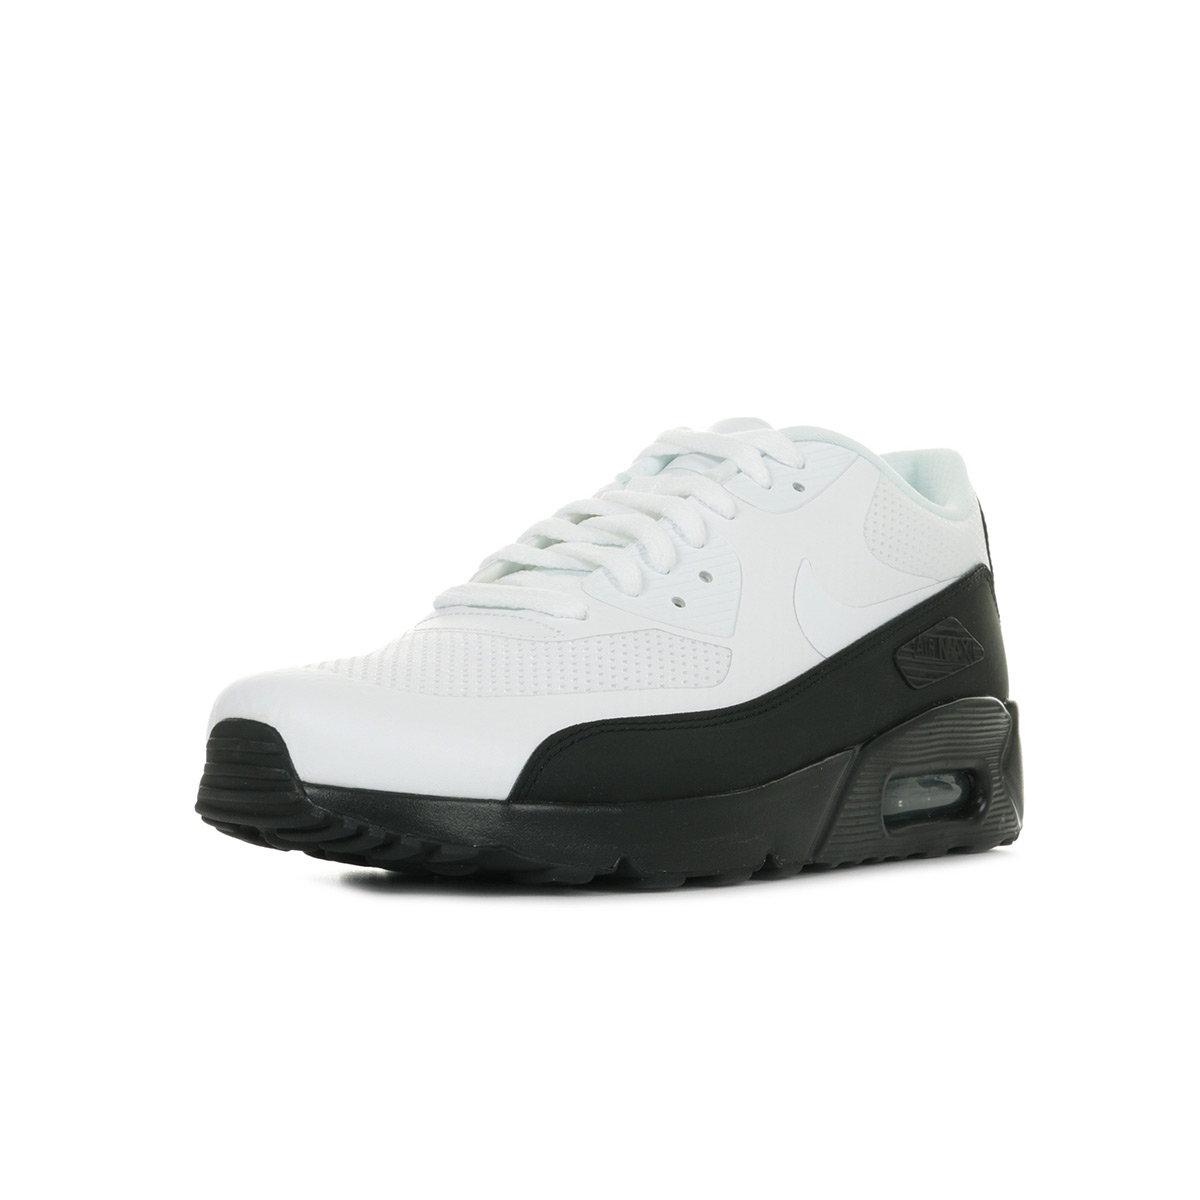 Nike Air Max 90 Ultra 2.0 Essential 875695015, Baskets mode